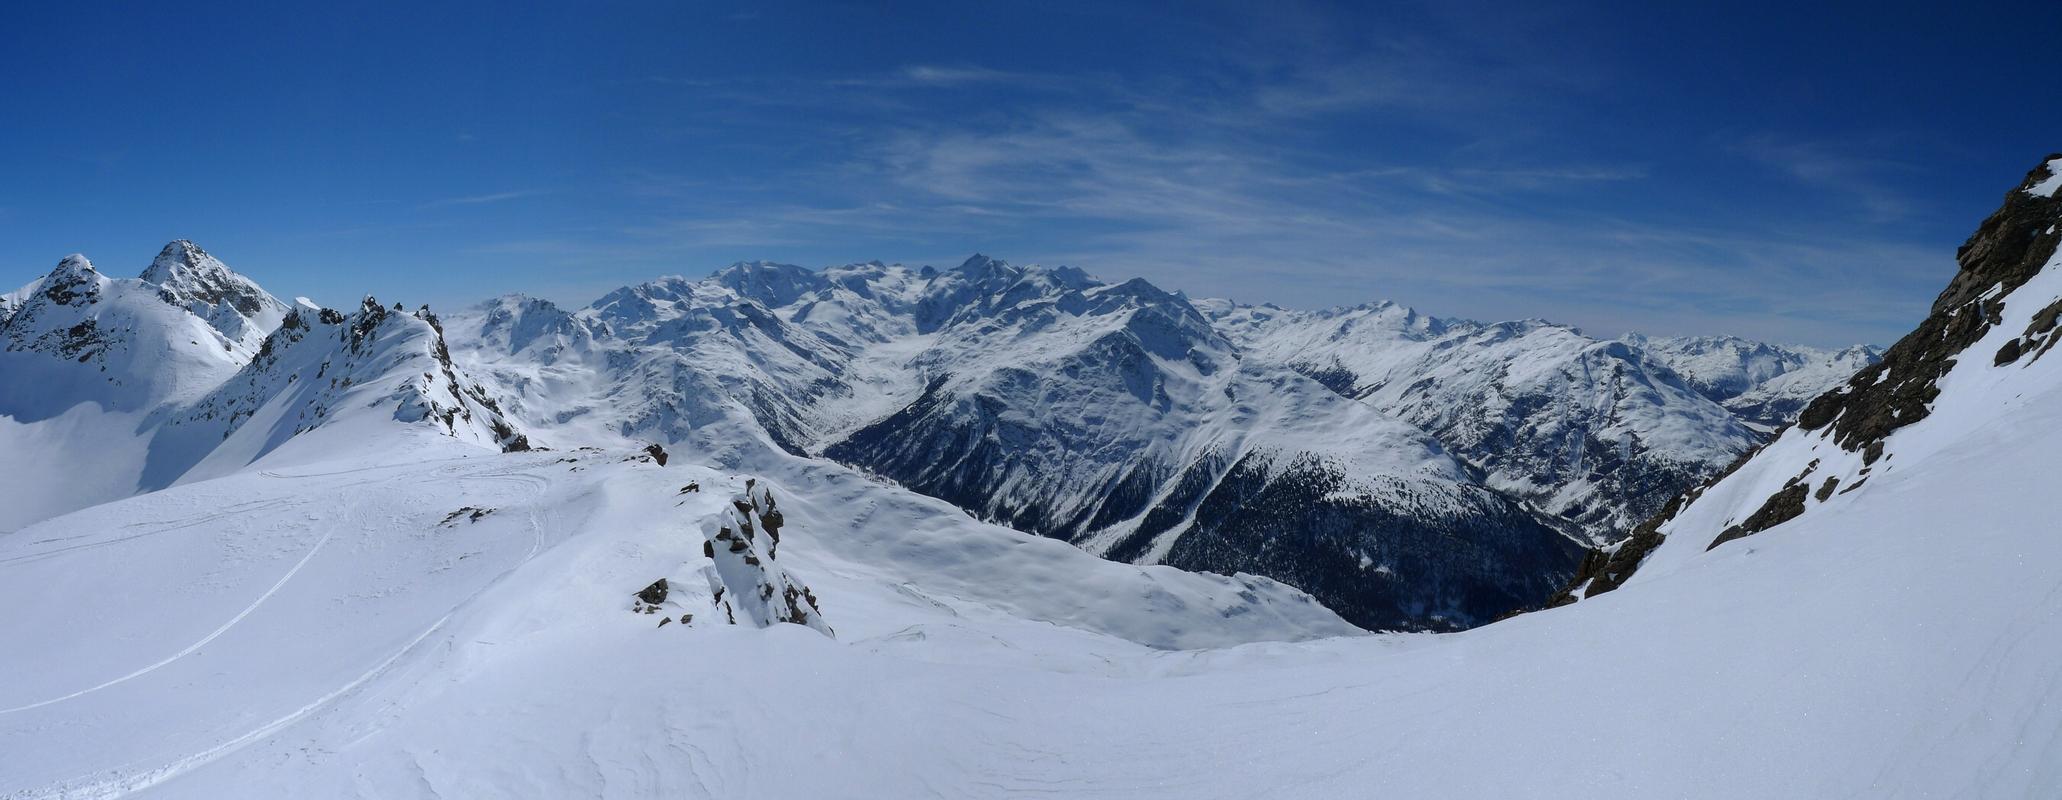 Piz Muragl Albula Alpen Švýcarsko panorama 24